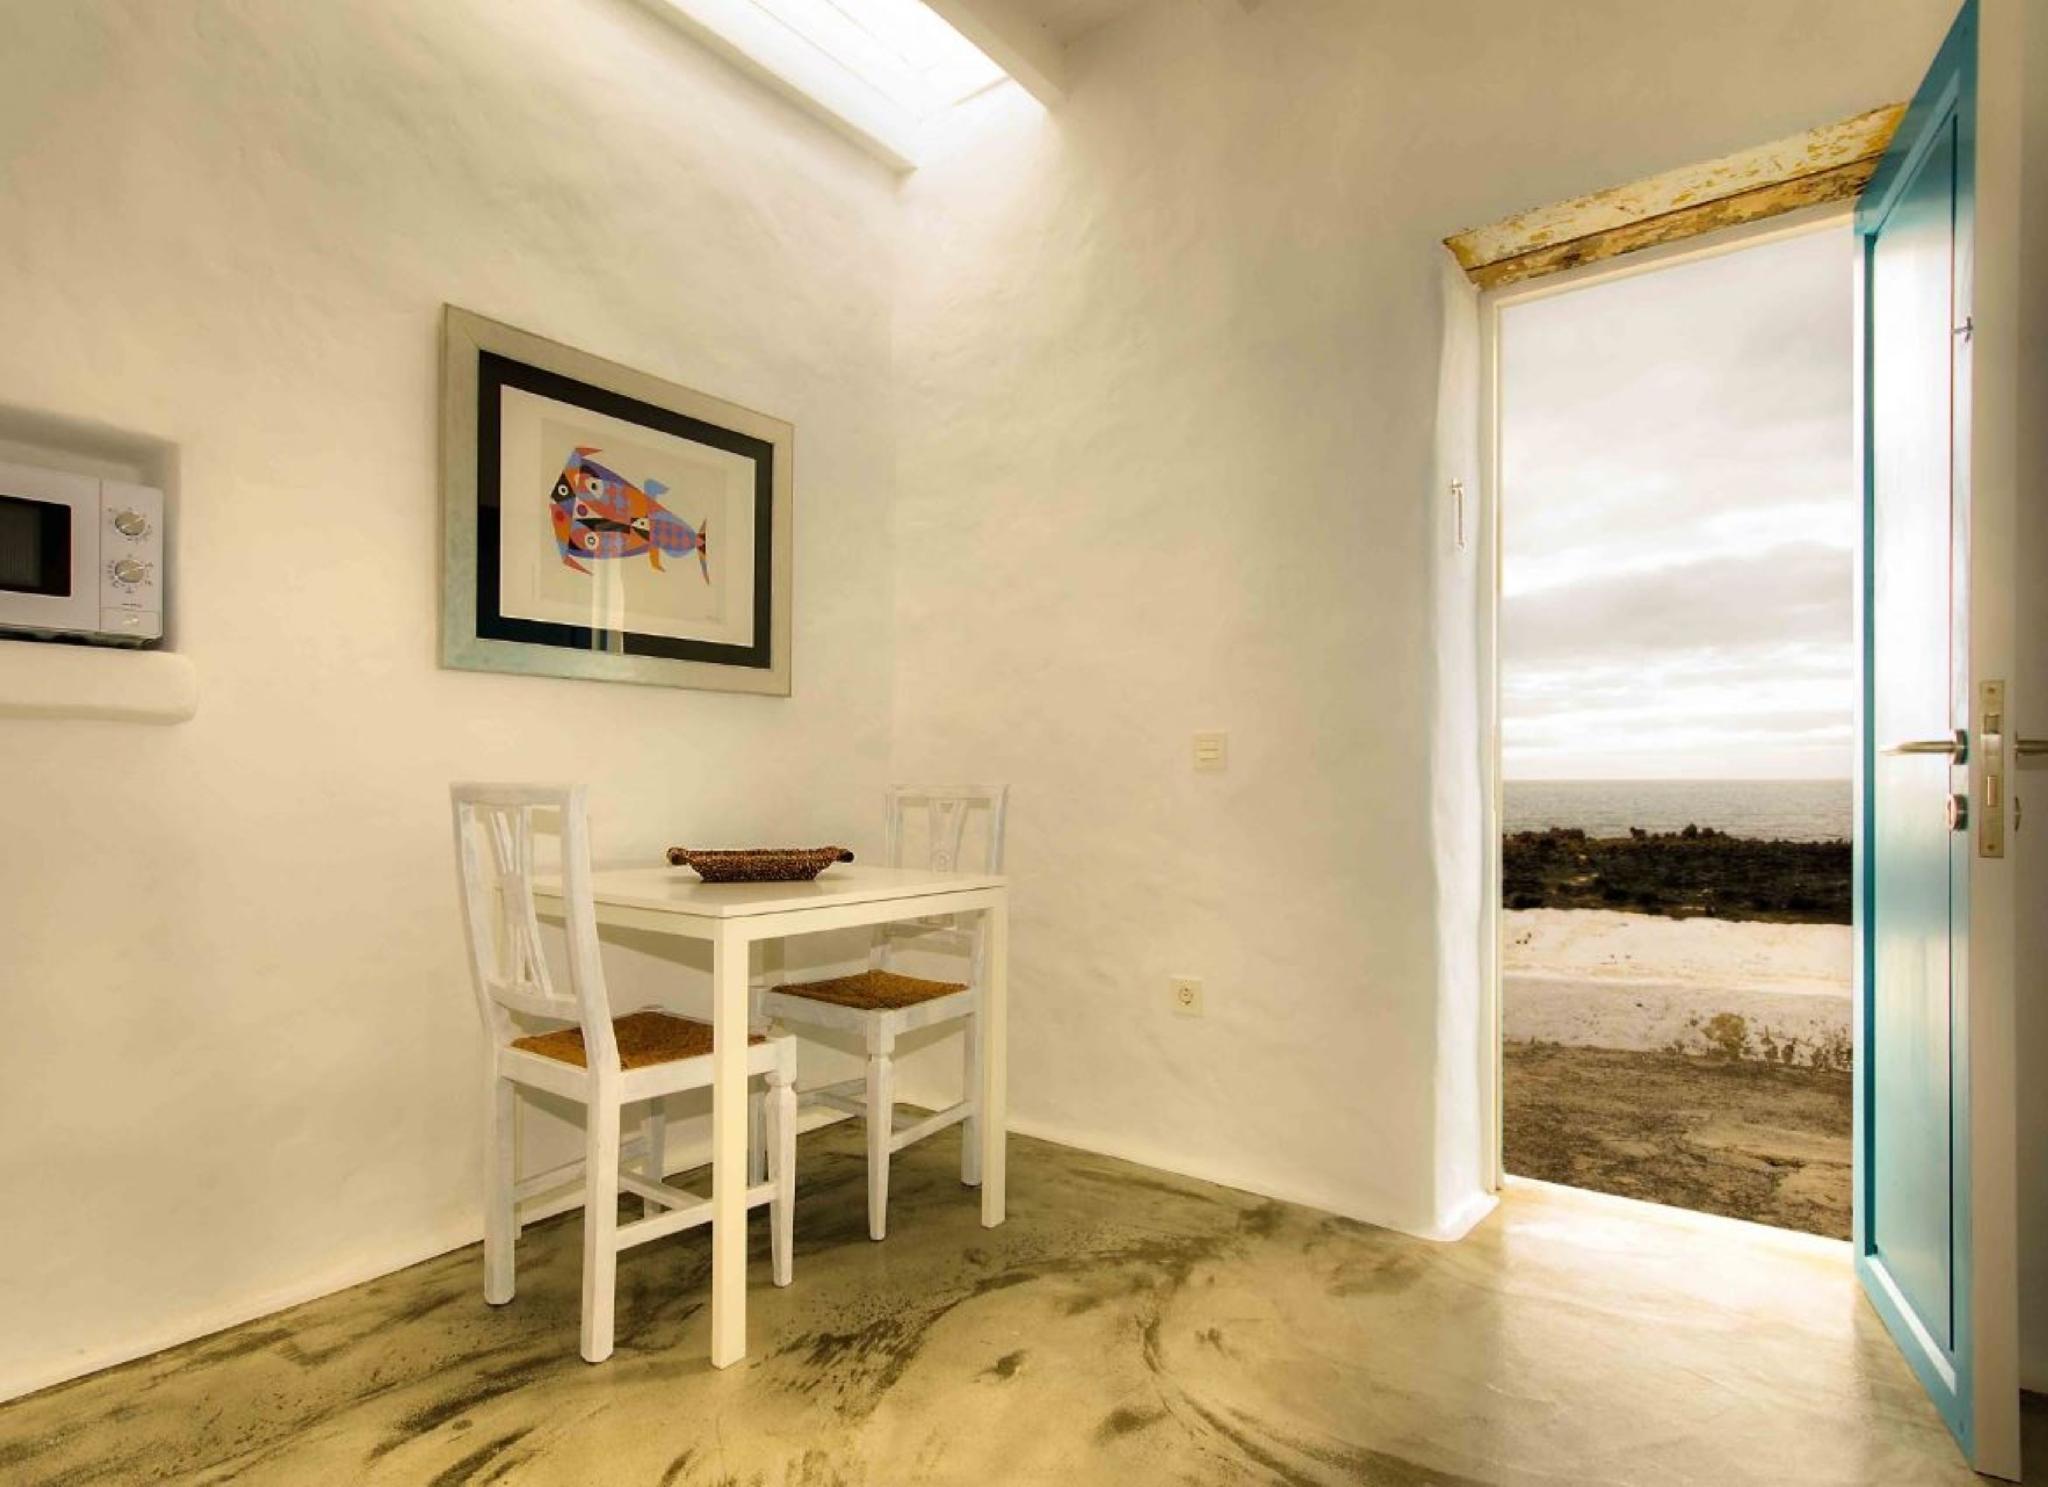 105903   Apartment In Lanzarote